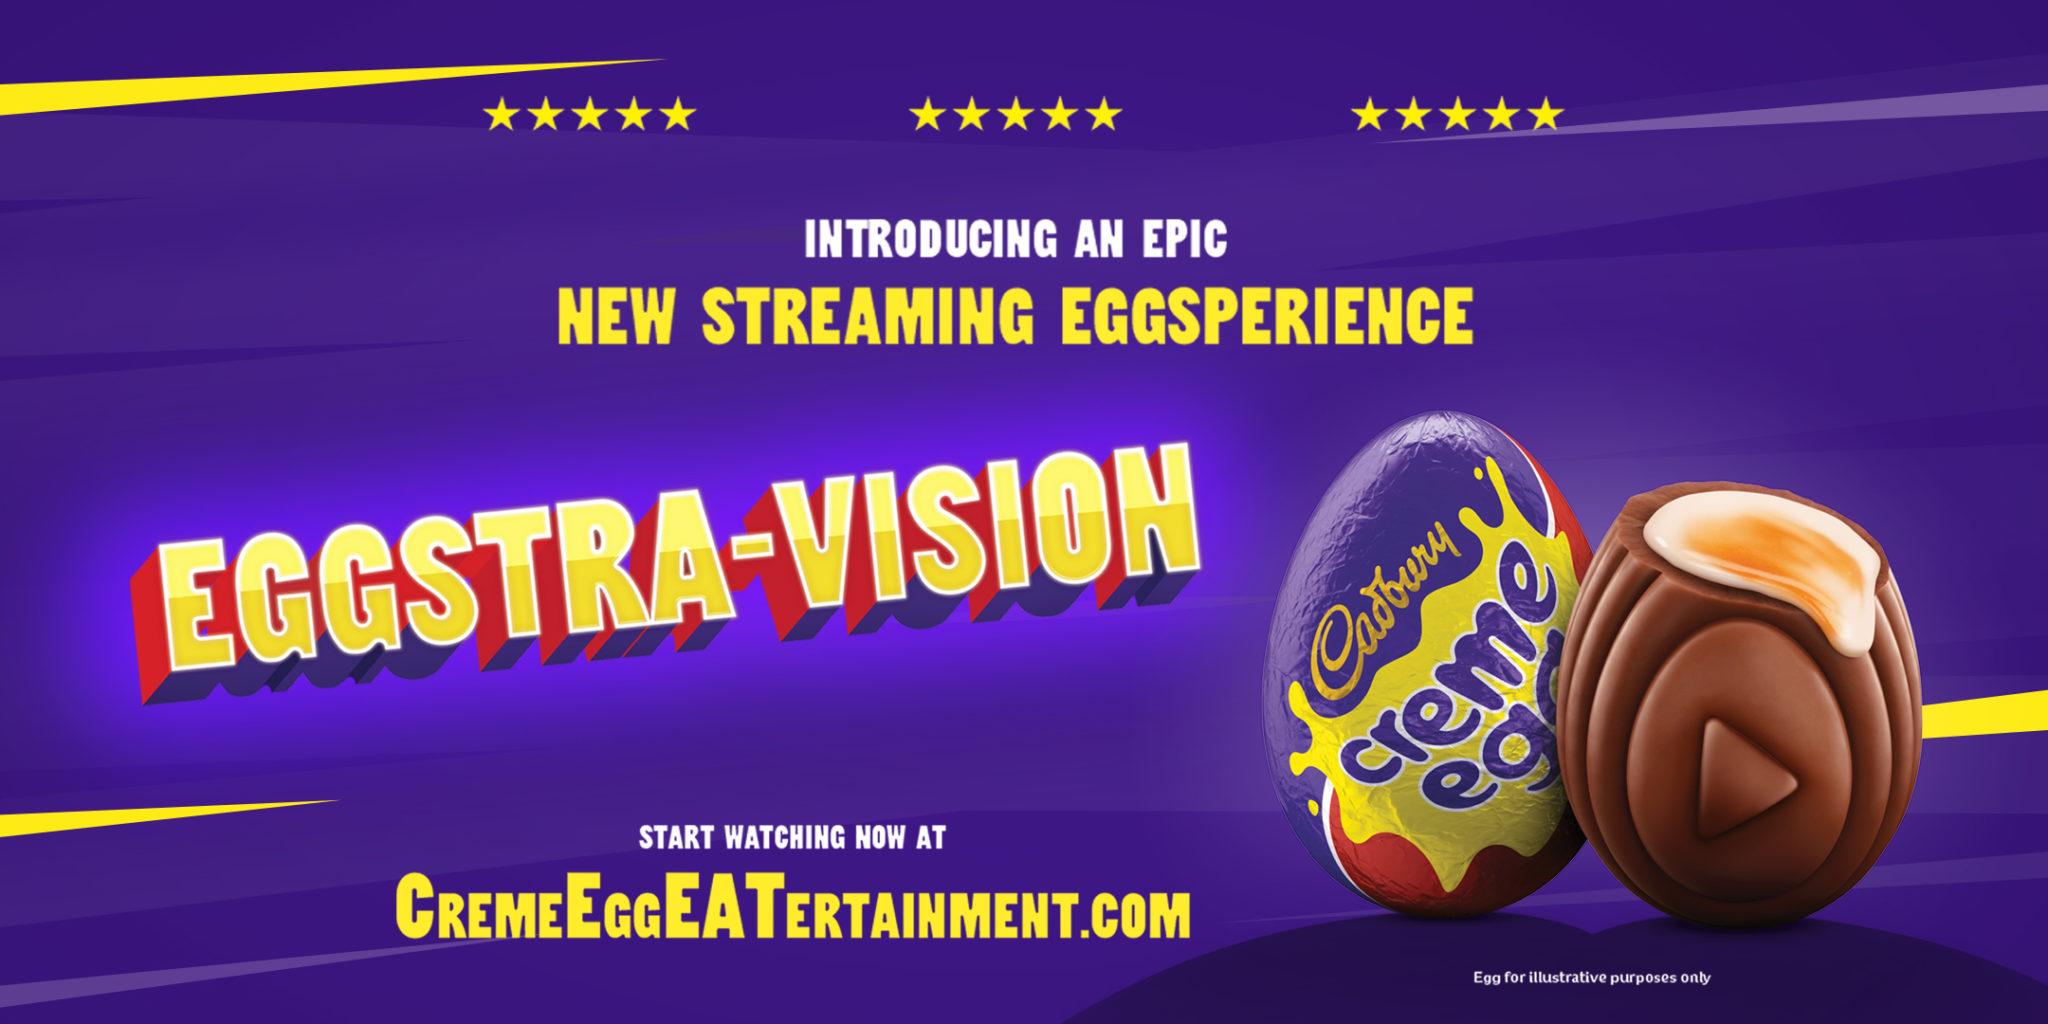 Creme Egg, Cadbury, Cadbury Creme Egg,